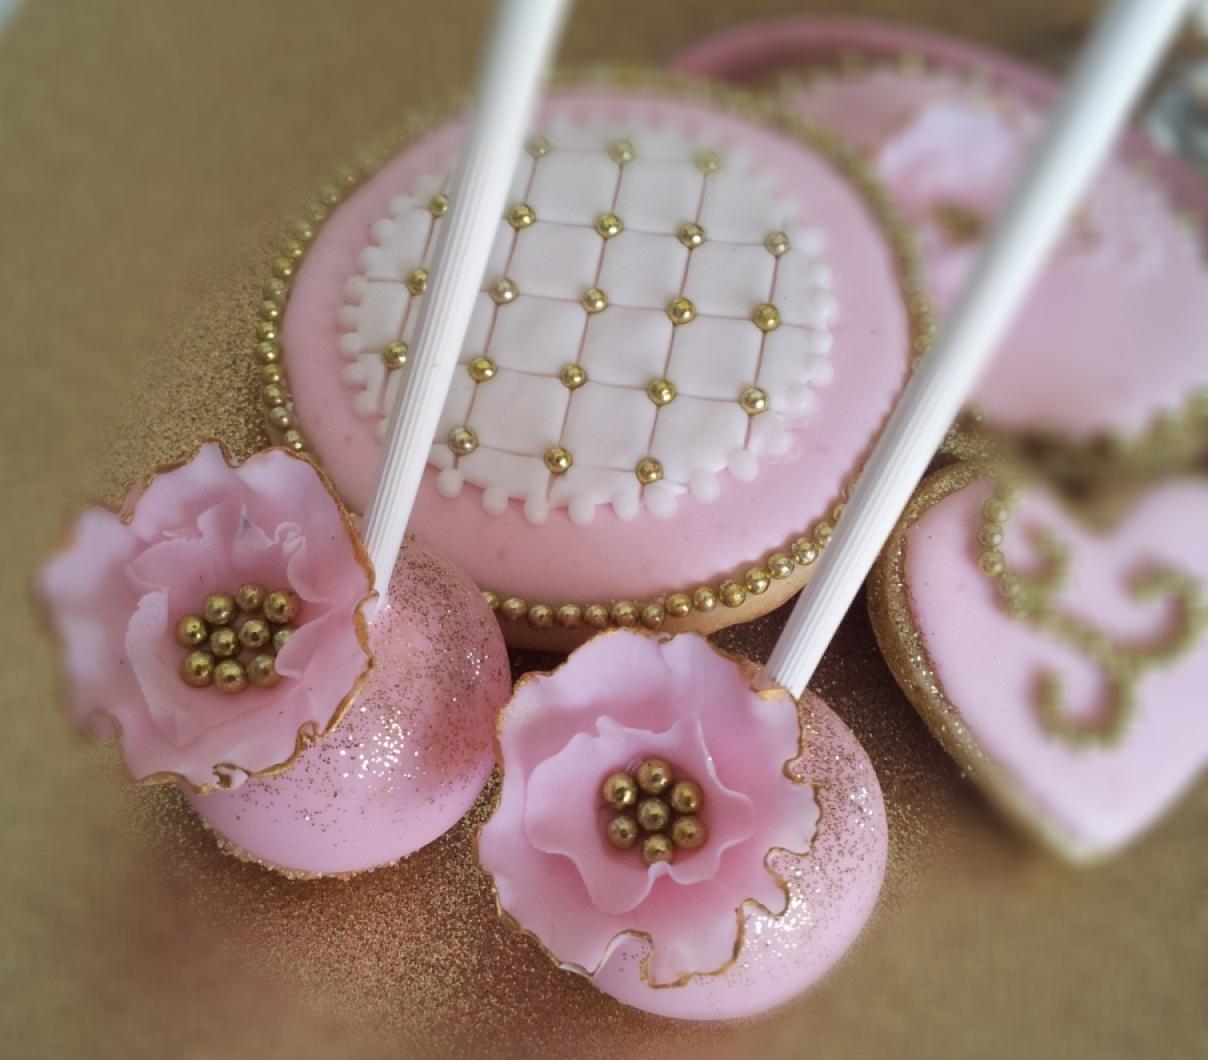 pink and gold wedding cake pops wedding cake pops